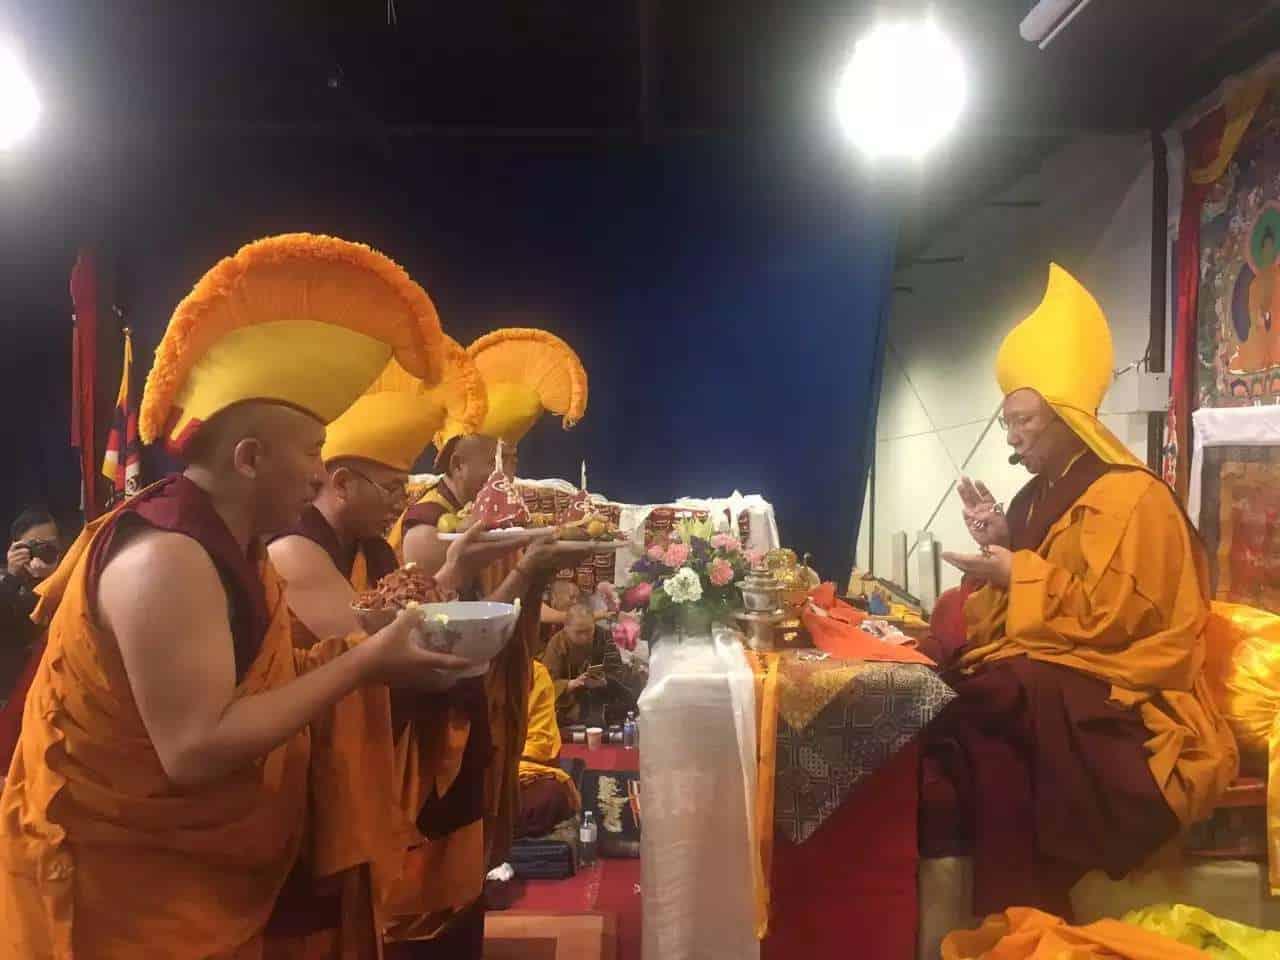 gosok-rinpoche-toronto-2016-31d2135de9a6a06b3b03bf3ee1df527